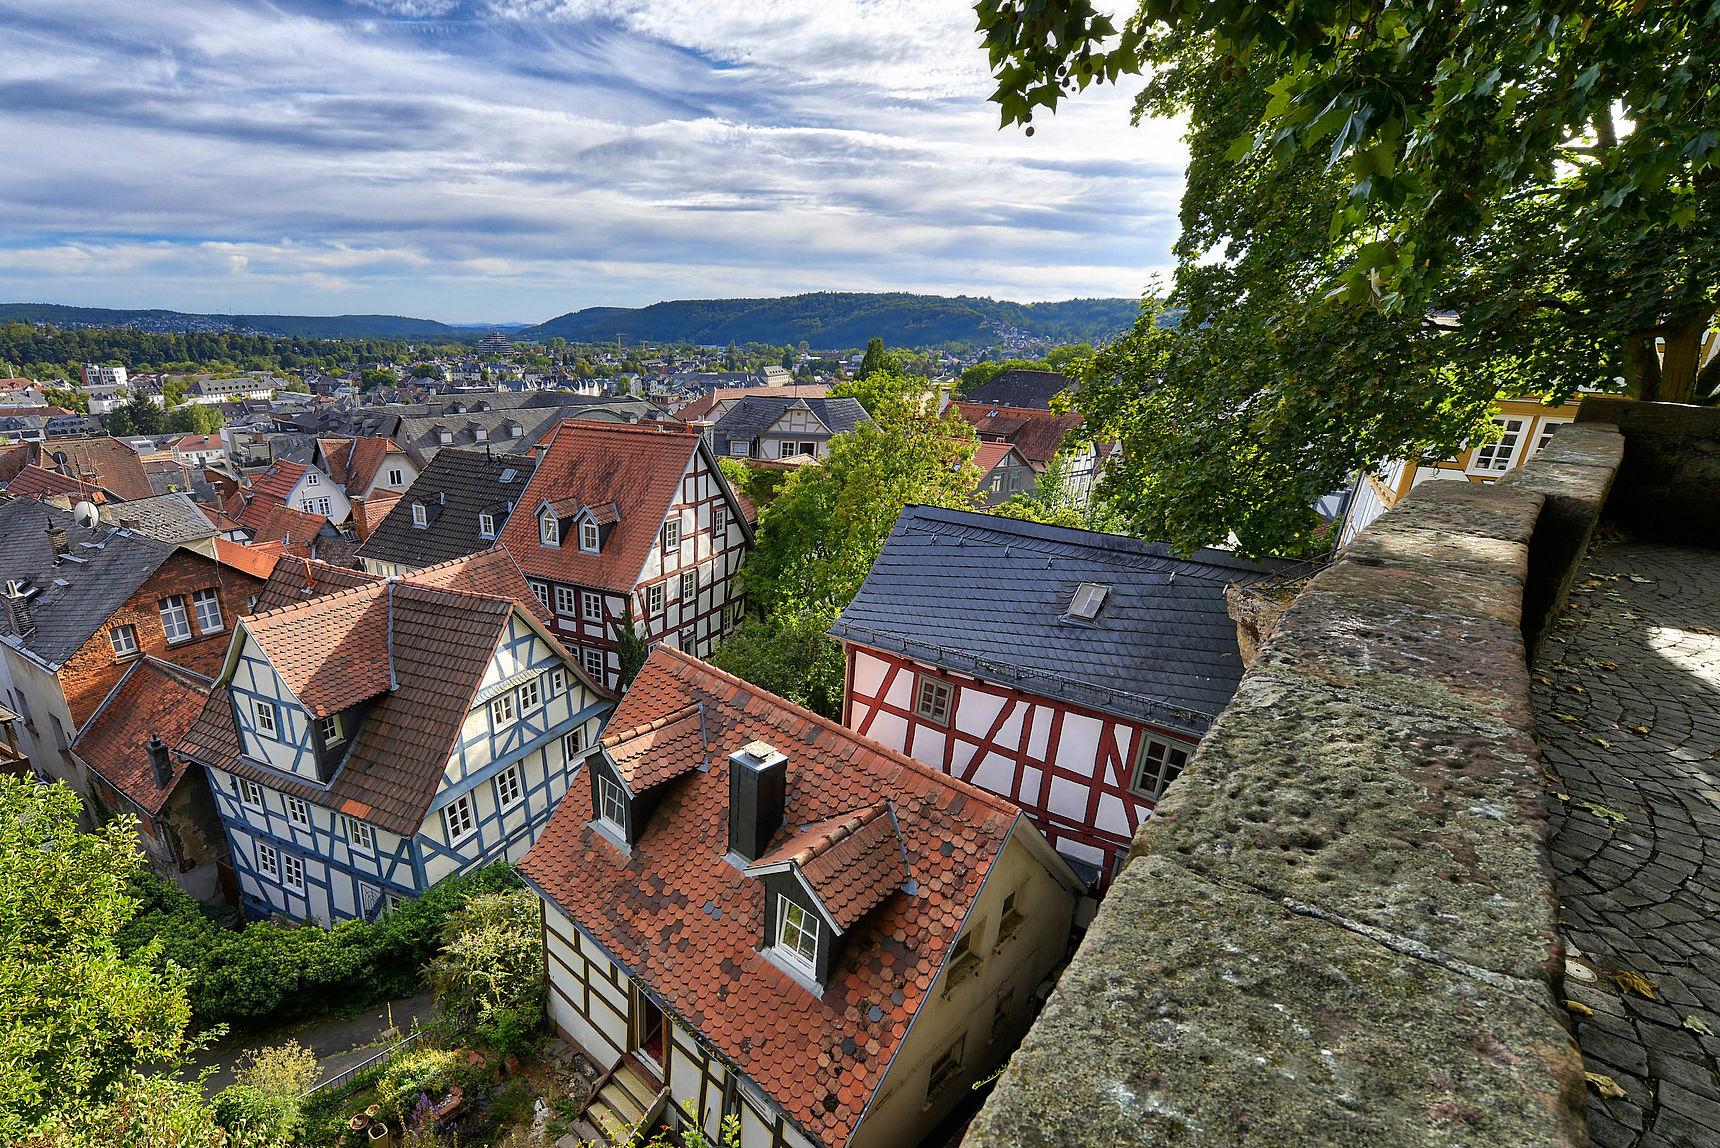 Lutherischer Kirchhof